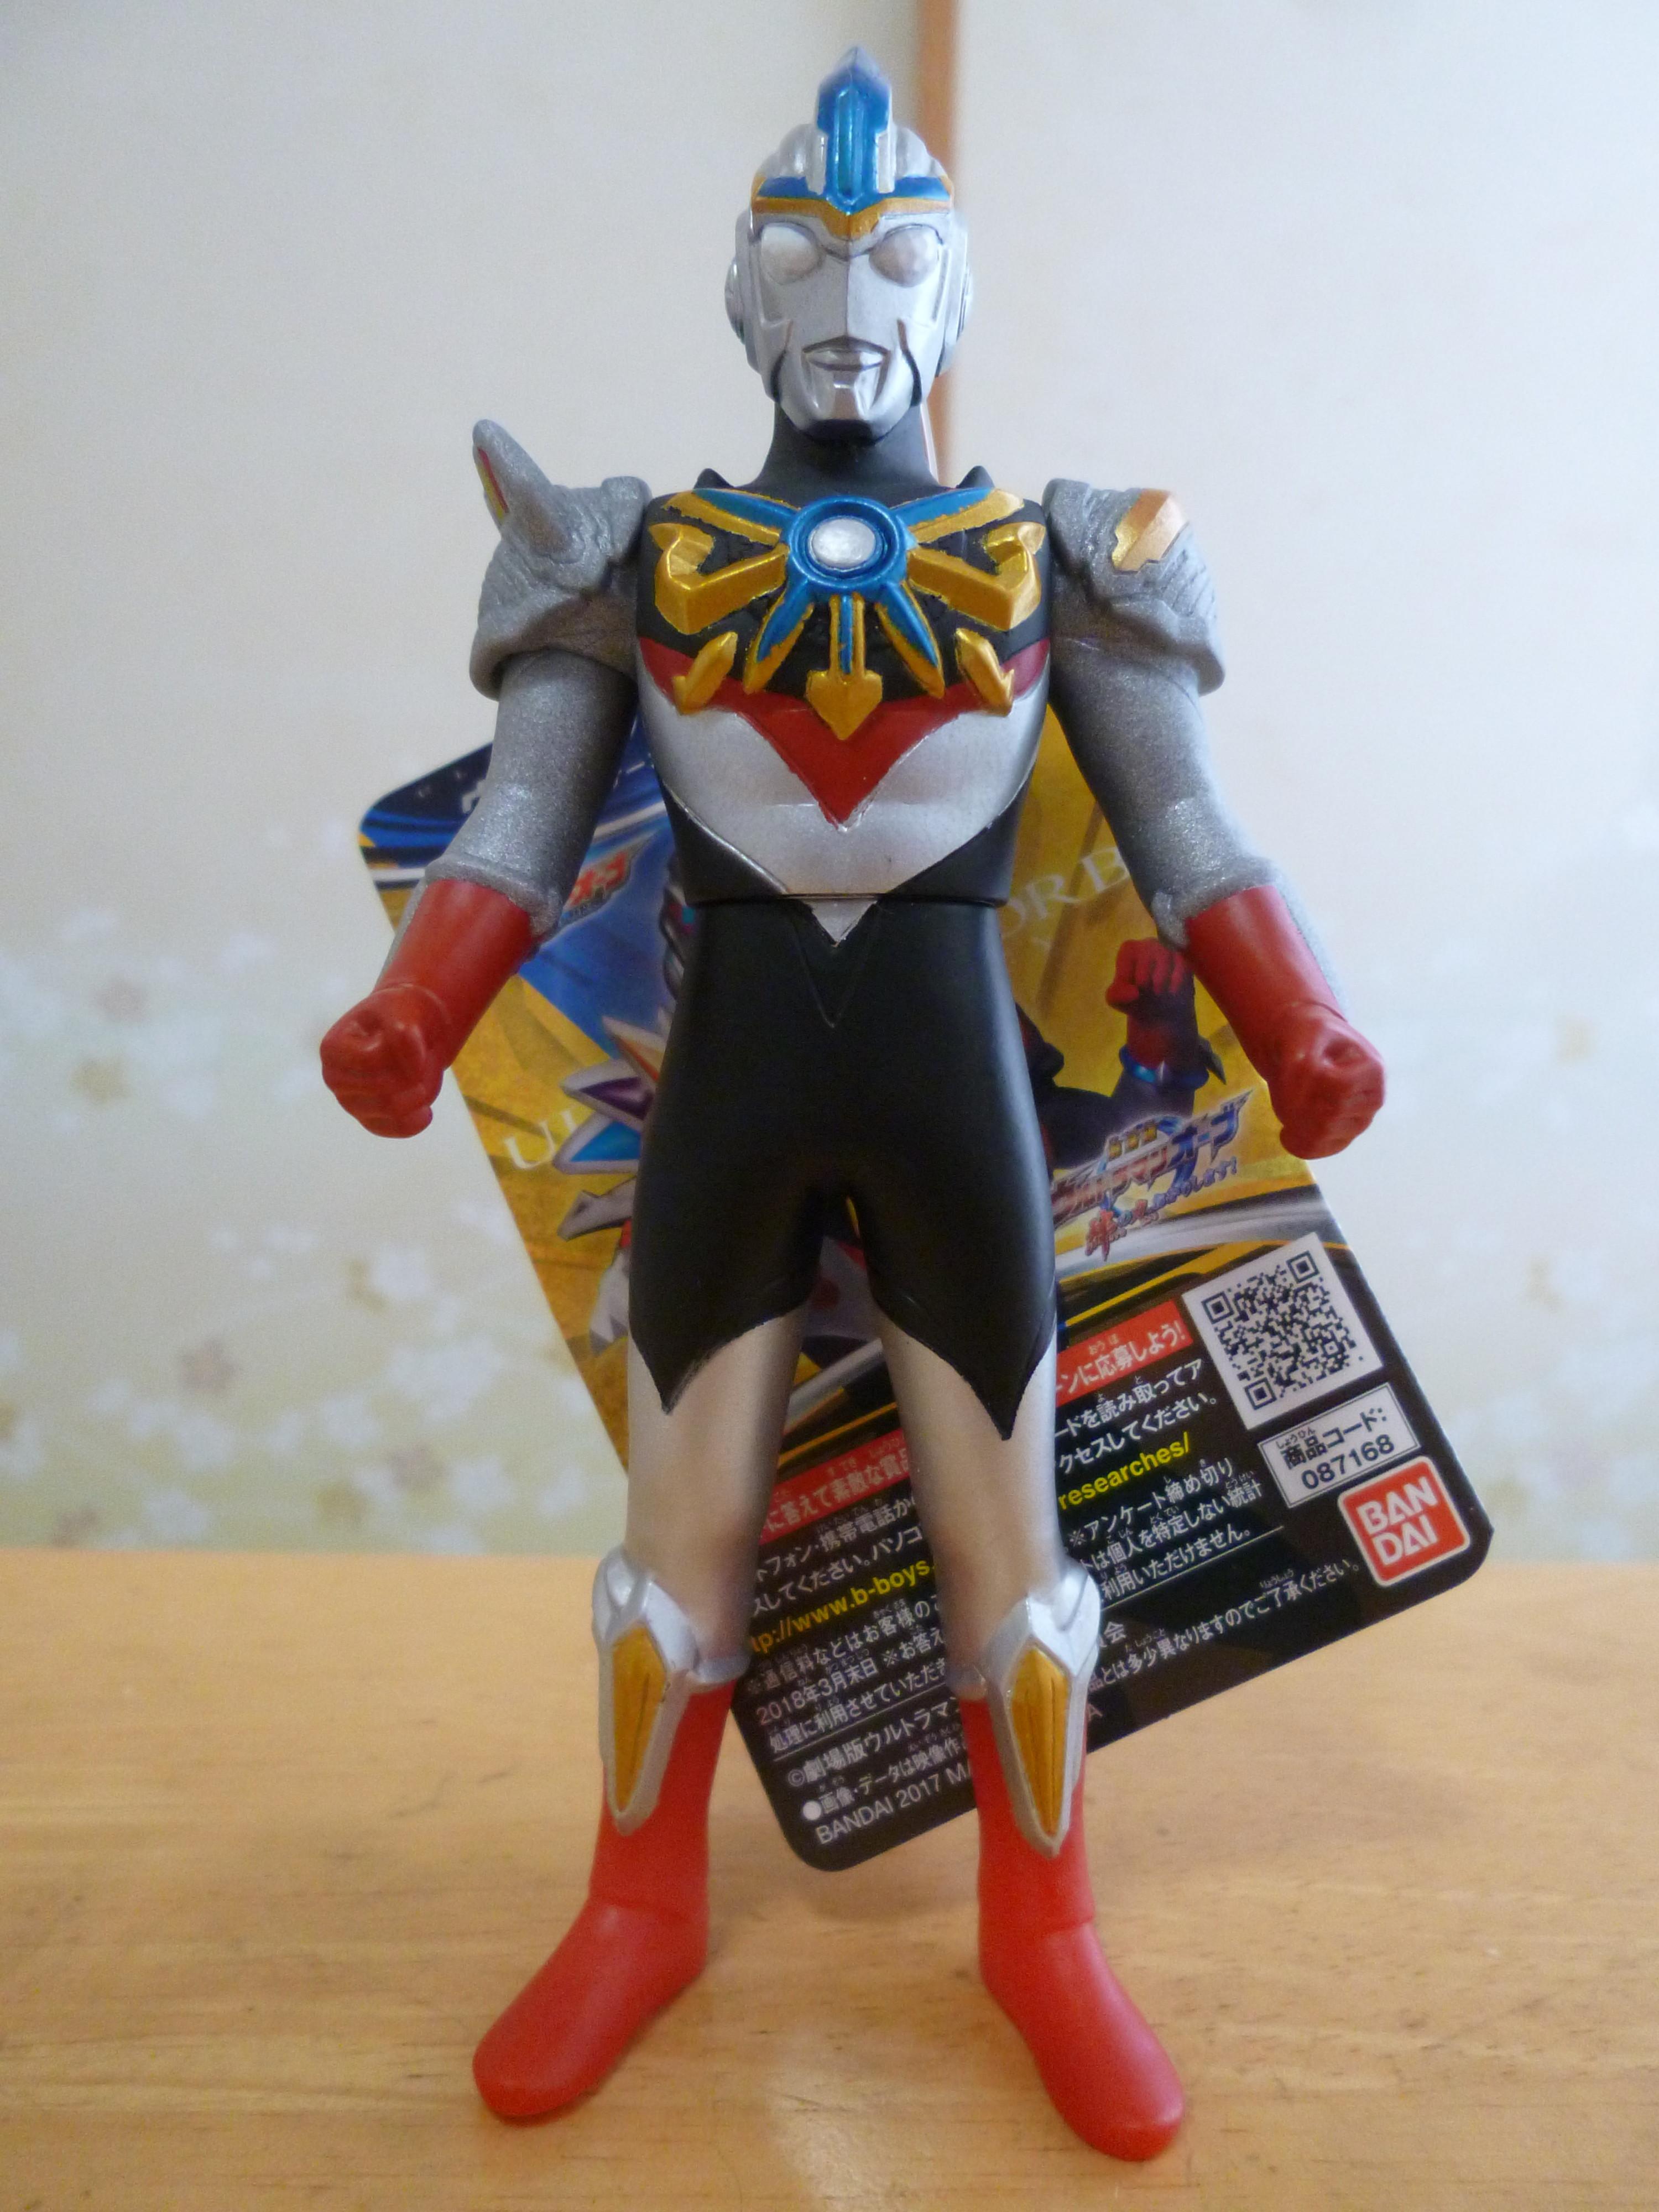 Bandai Ultra Hero Orb 06 Ultraman Trinity Daftar Harga Balon Motif Toy